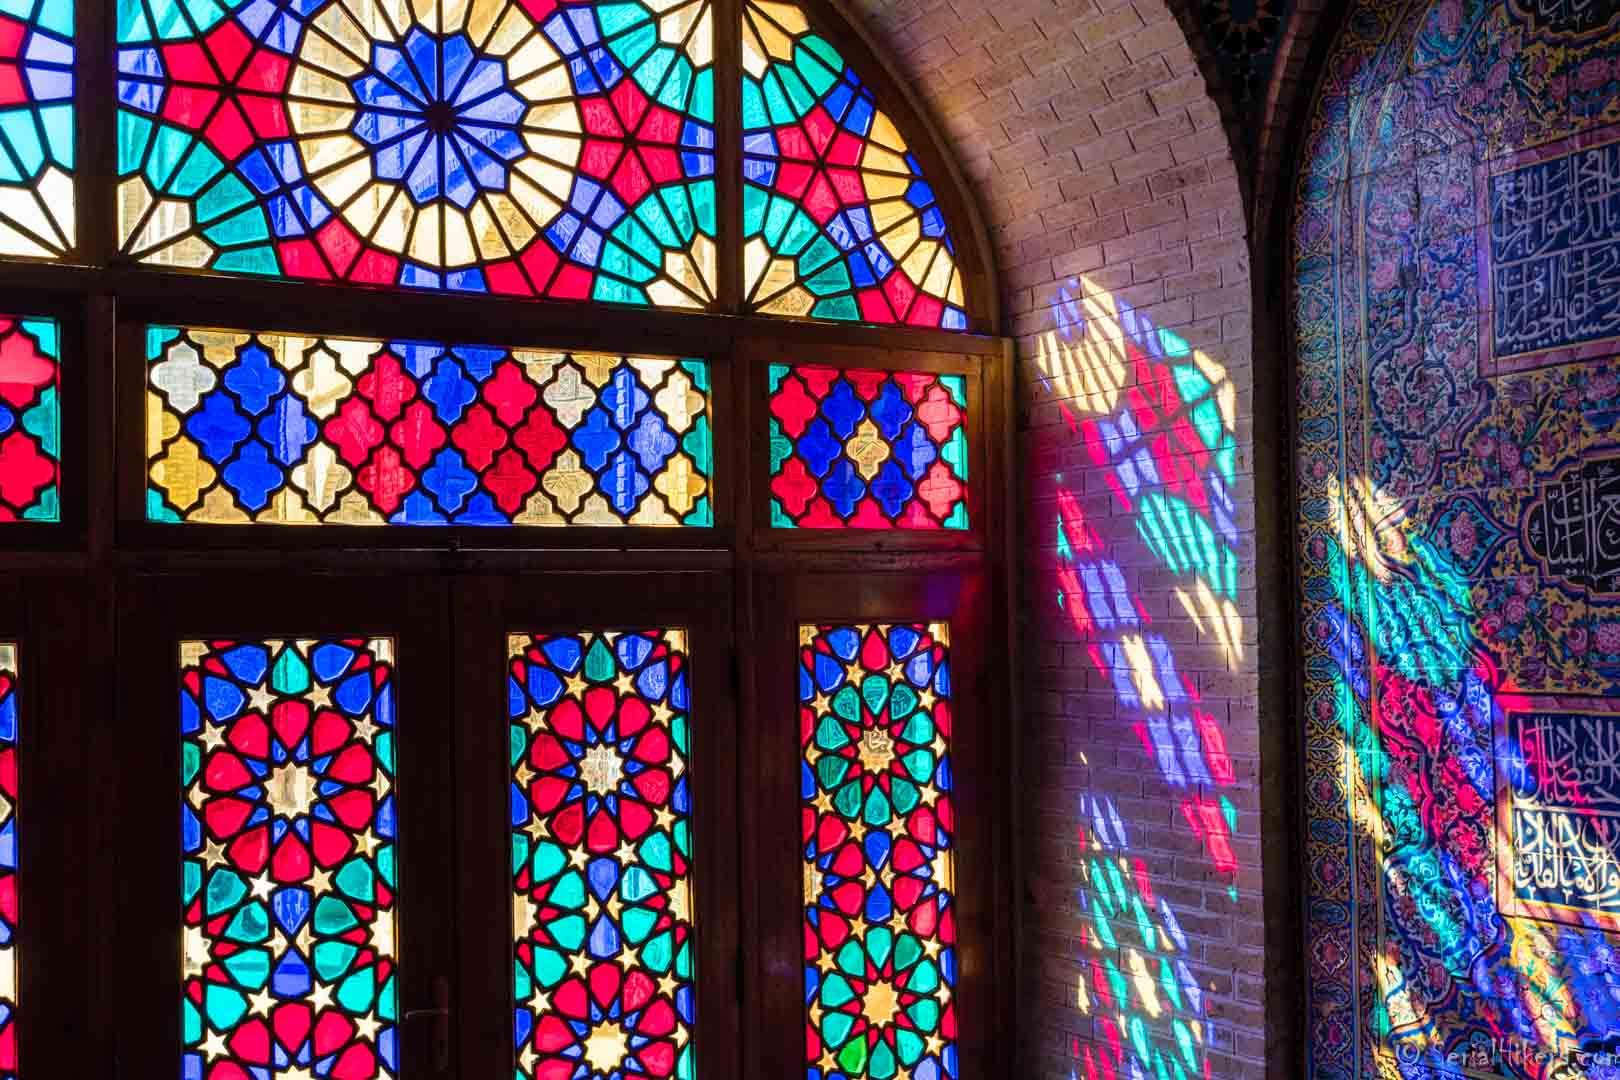 SerialHikers stop autostop world monde tour hitchhiking aventure adventure alternative travel voyage sans avion no fly Iran Chiraz Shiraz pink mosque mosquée rose